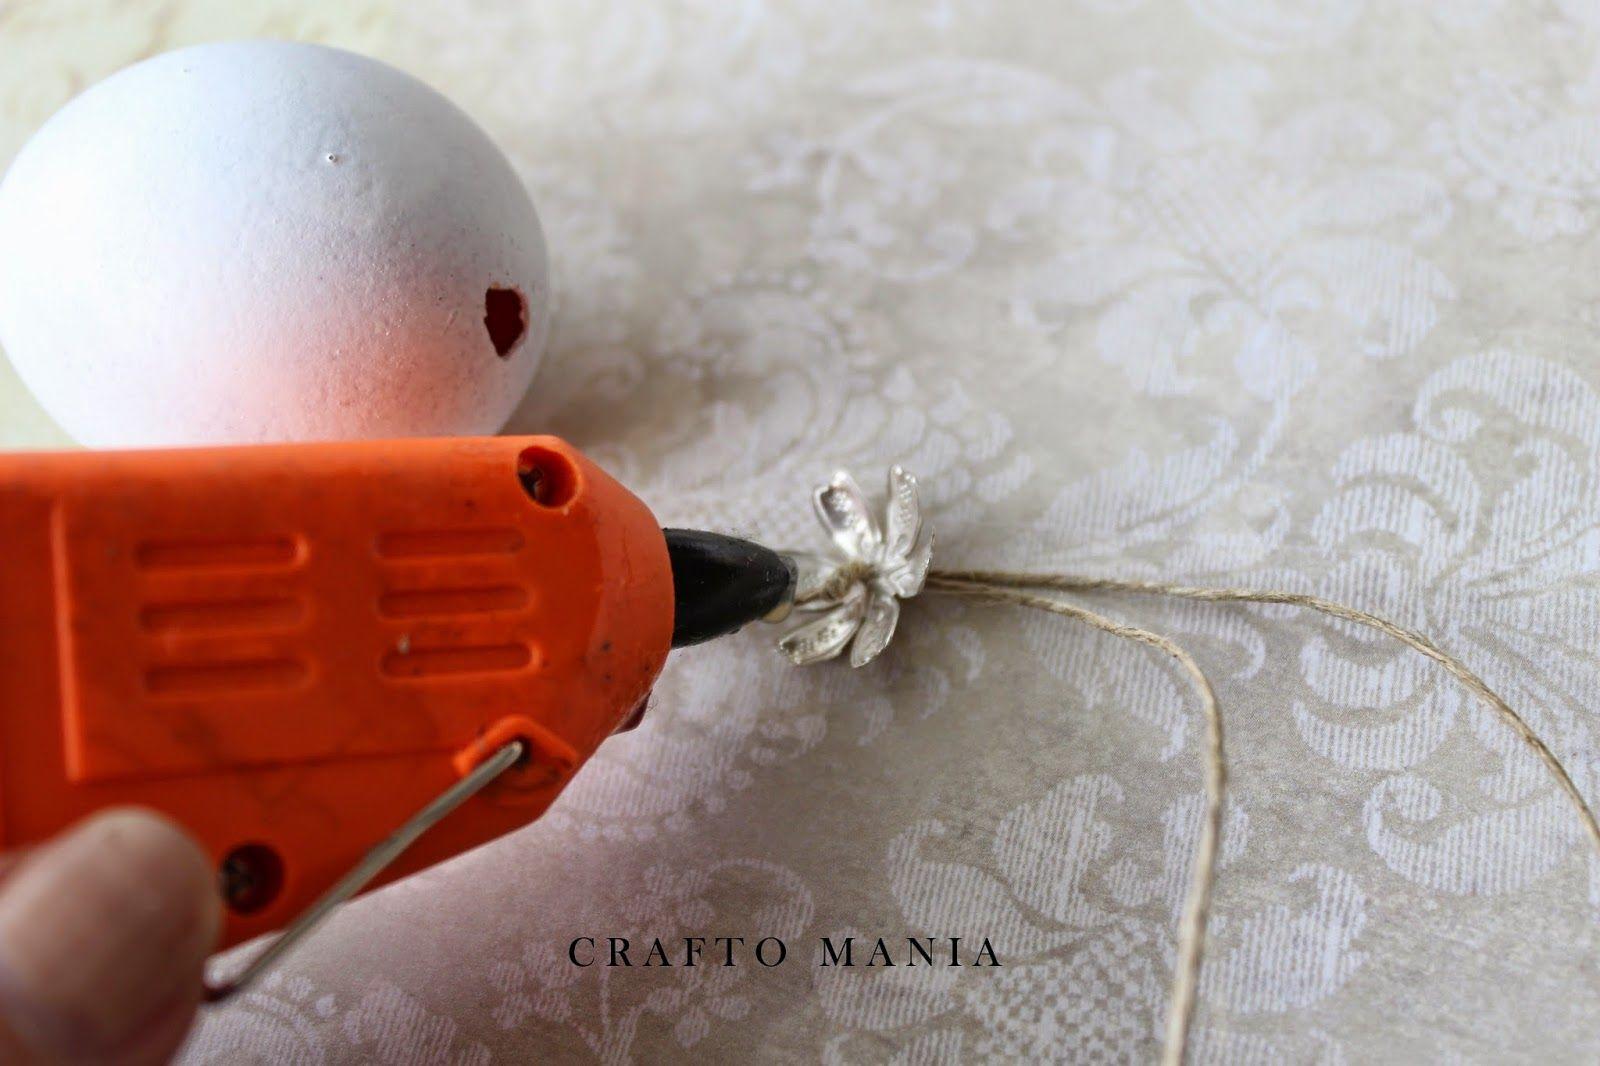 crafto-mania